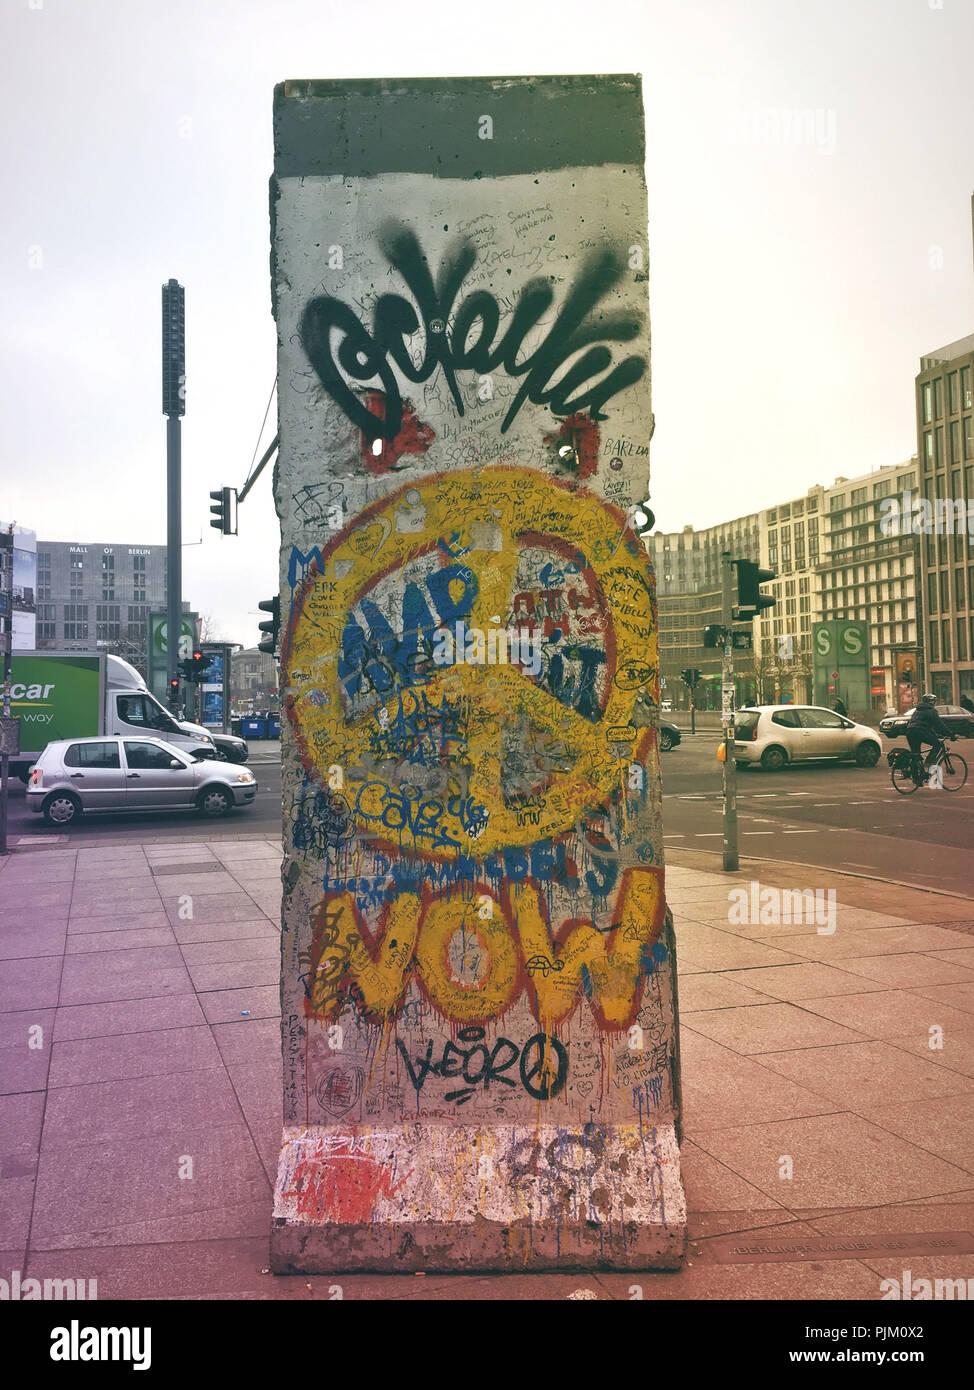 El muro de Berlín, restos, graffiti Imagen De Stock